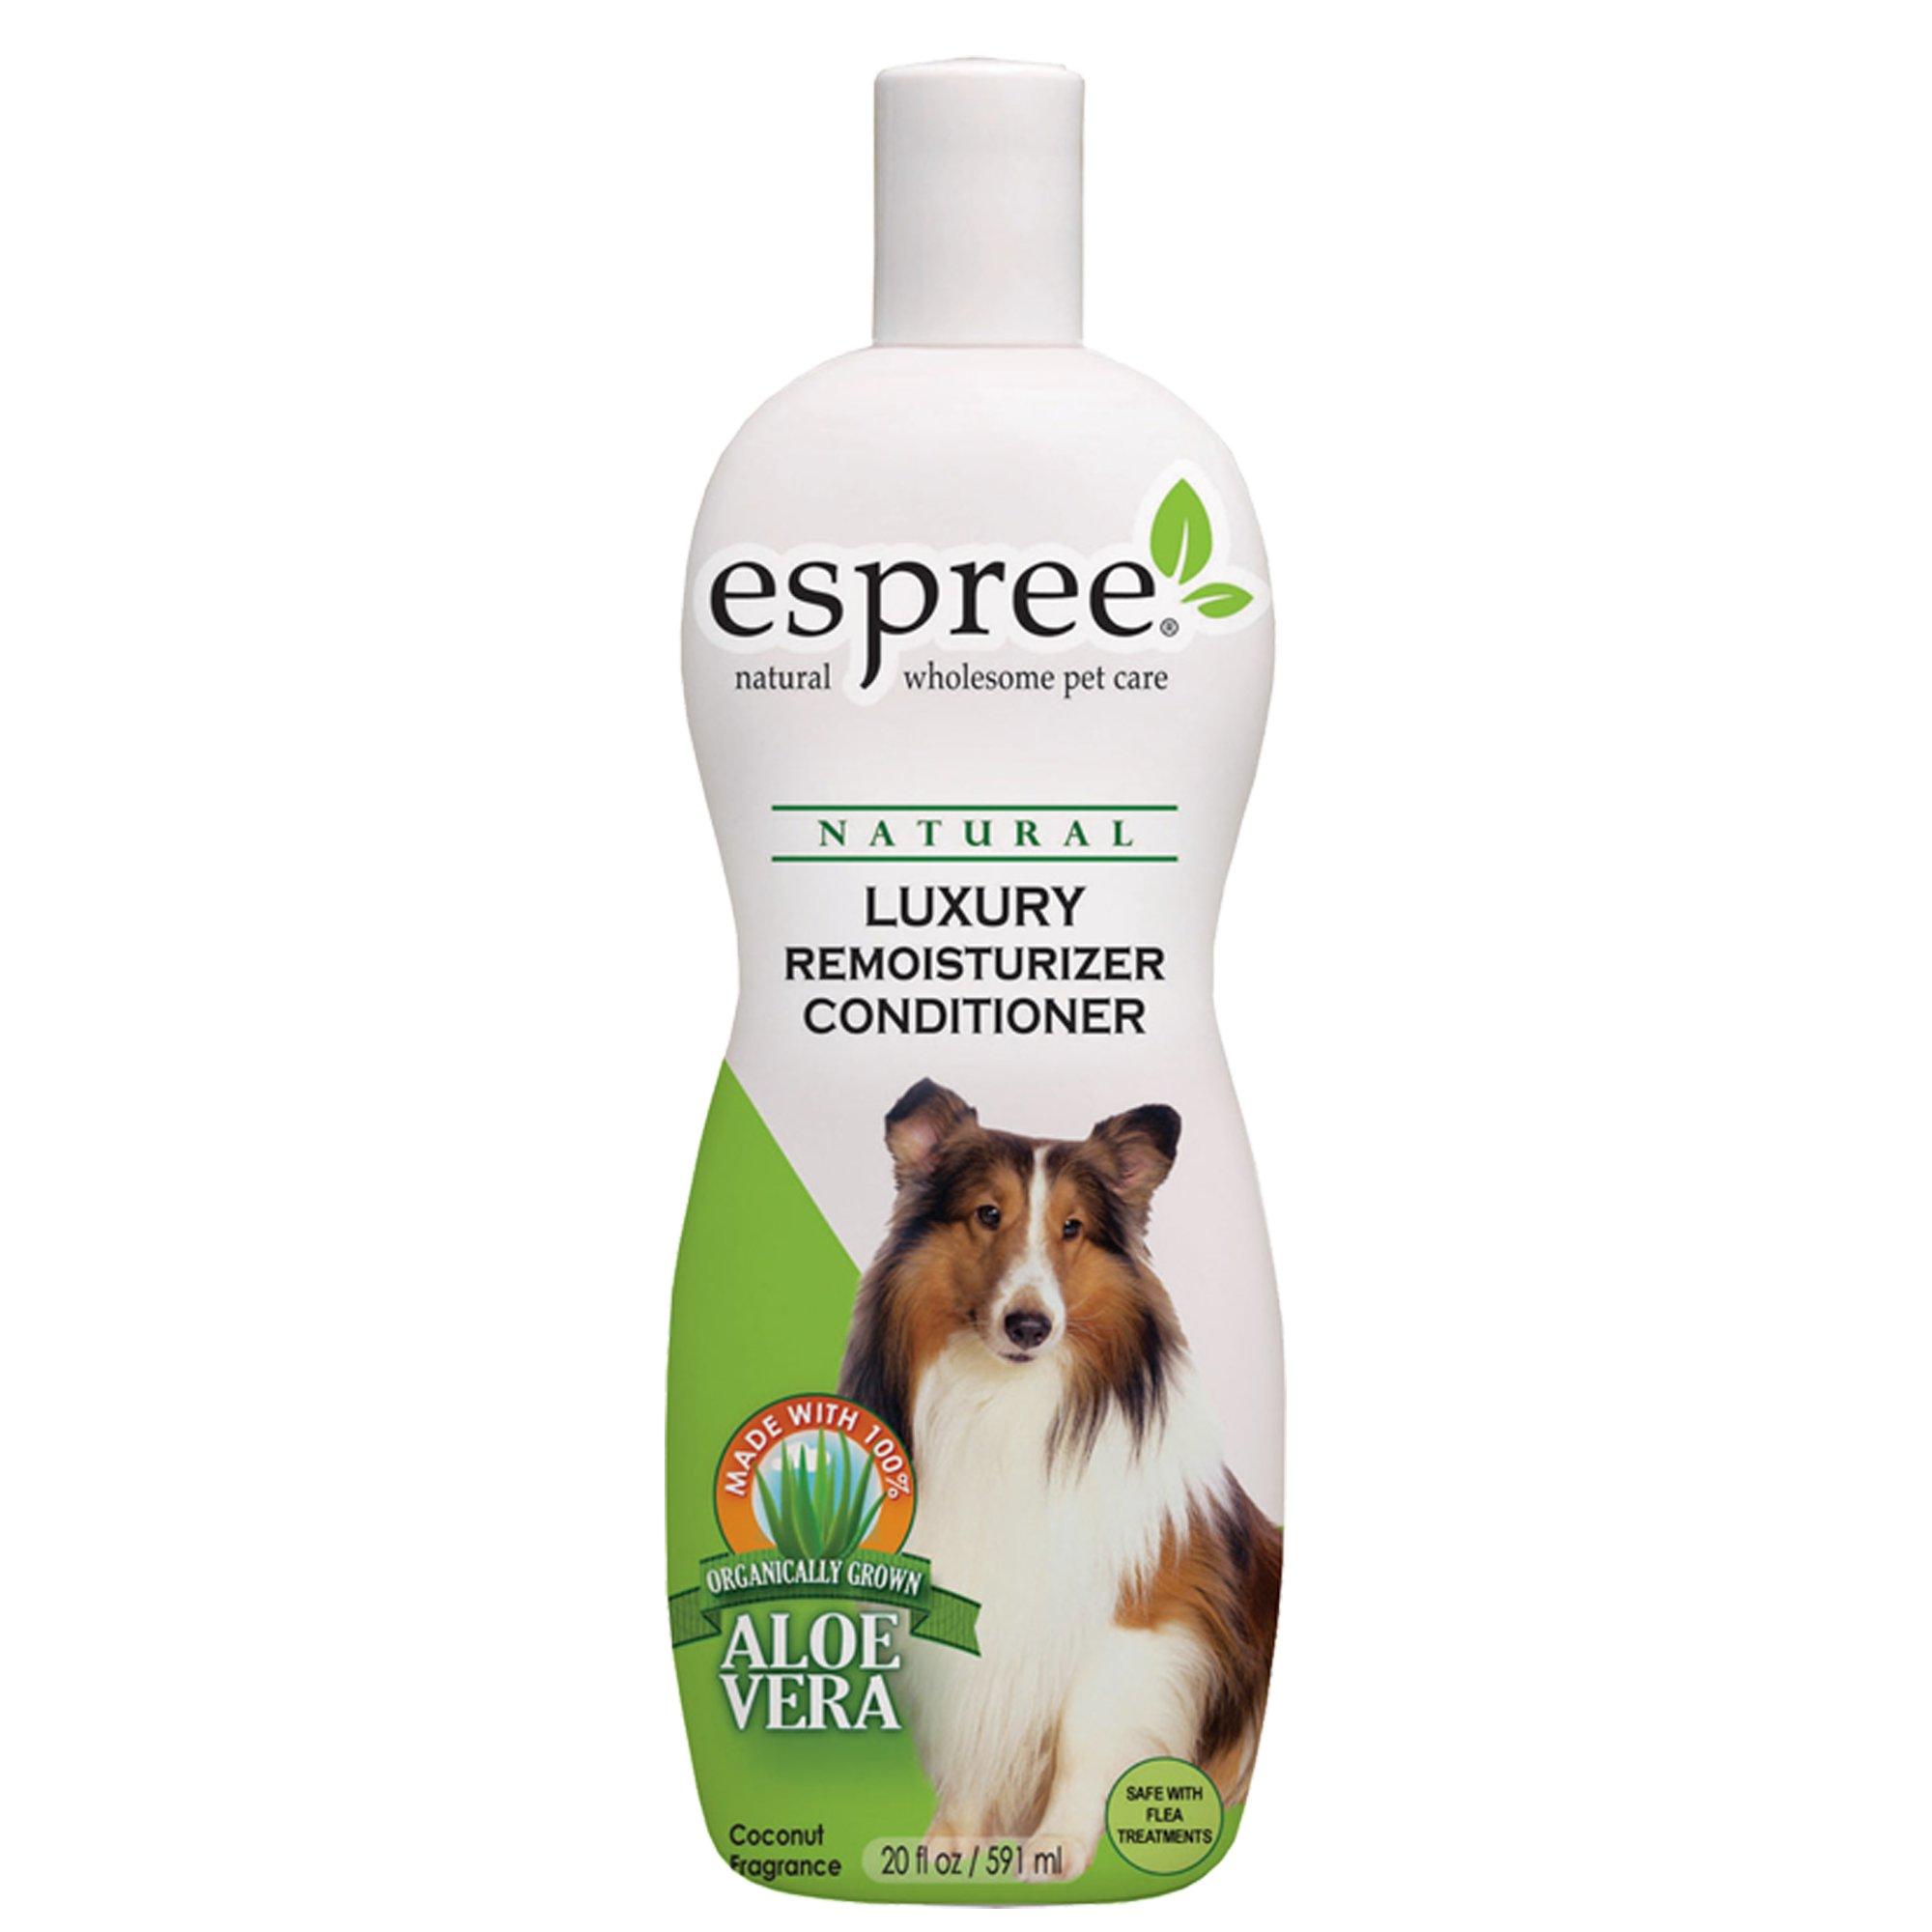 Espree Natural Luxury Remoisturizer Dog and Cat Conditioner